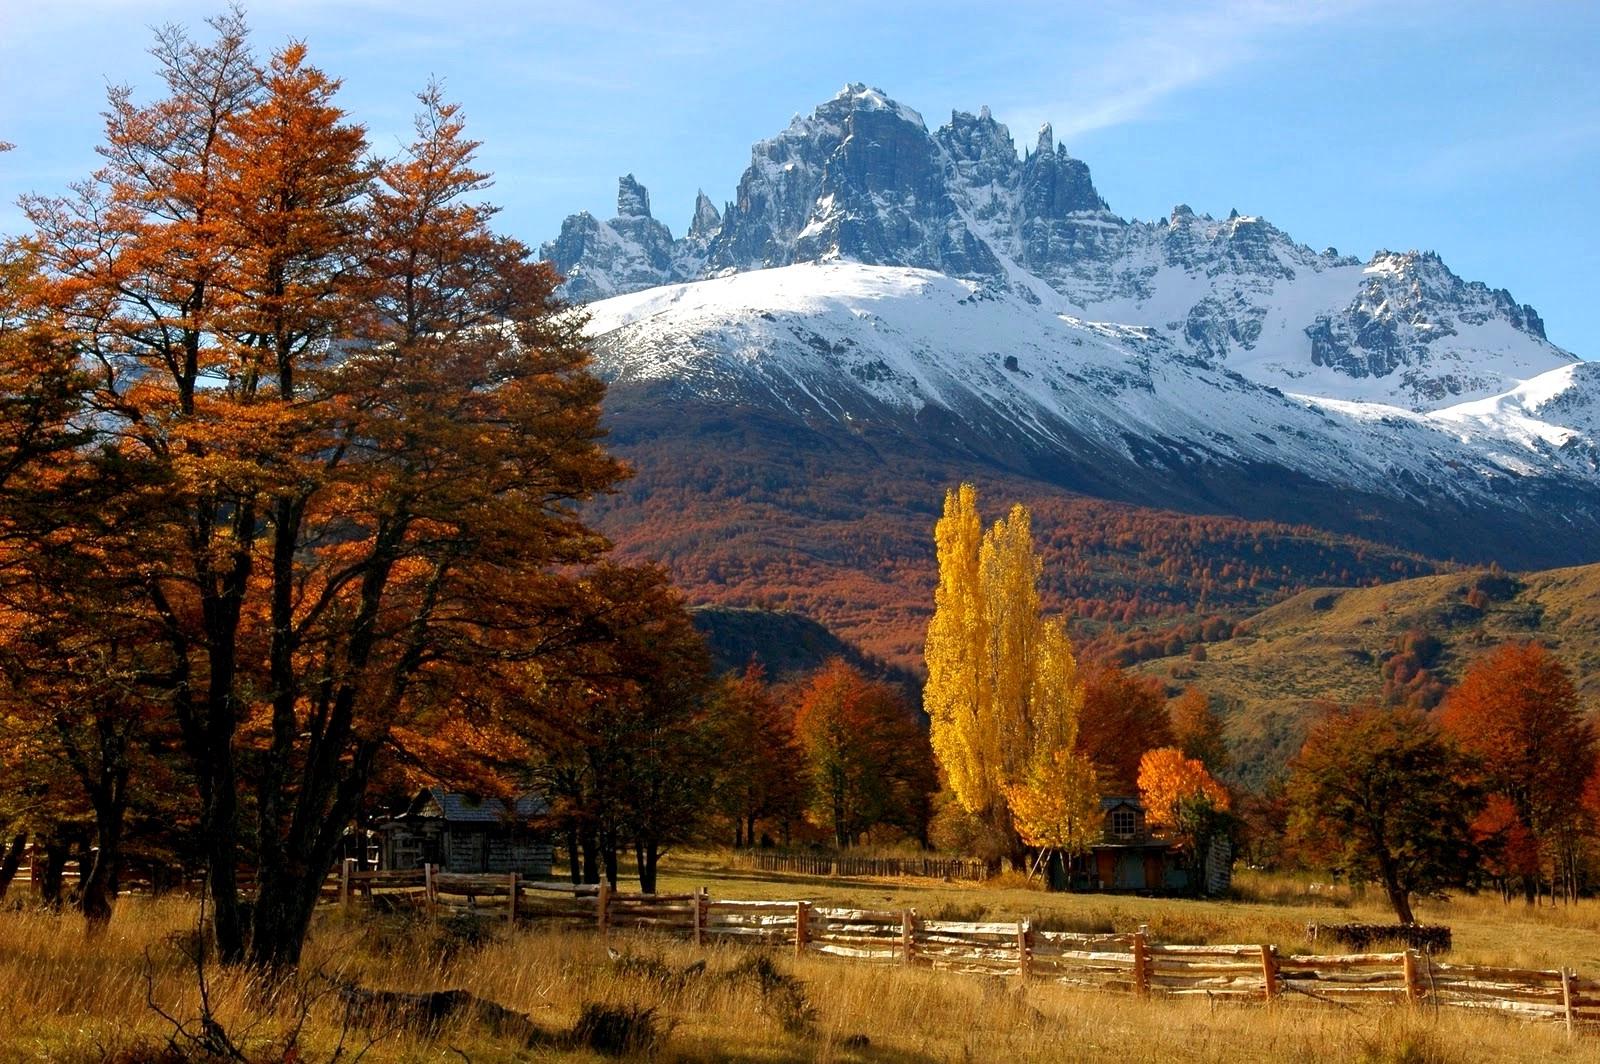 Fall Leaves Hd Wallpapers 1080p Fondos De Pantalla 193 Rboles Bosque Oto 241 O Colina